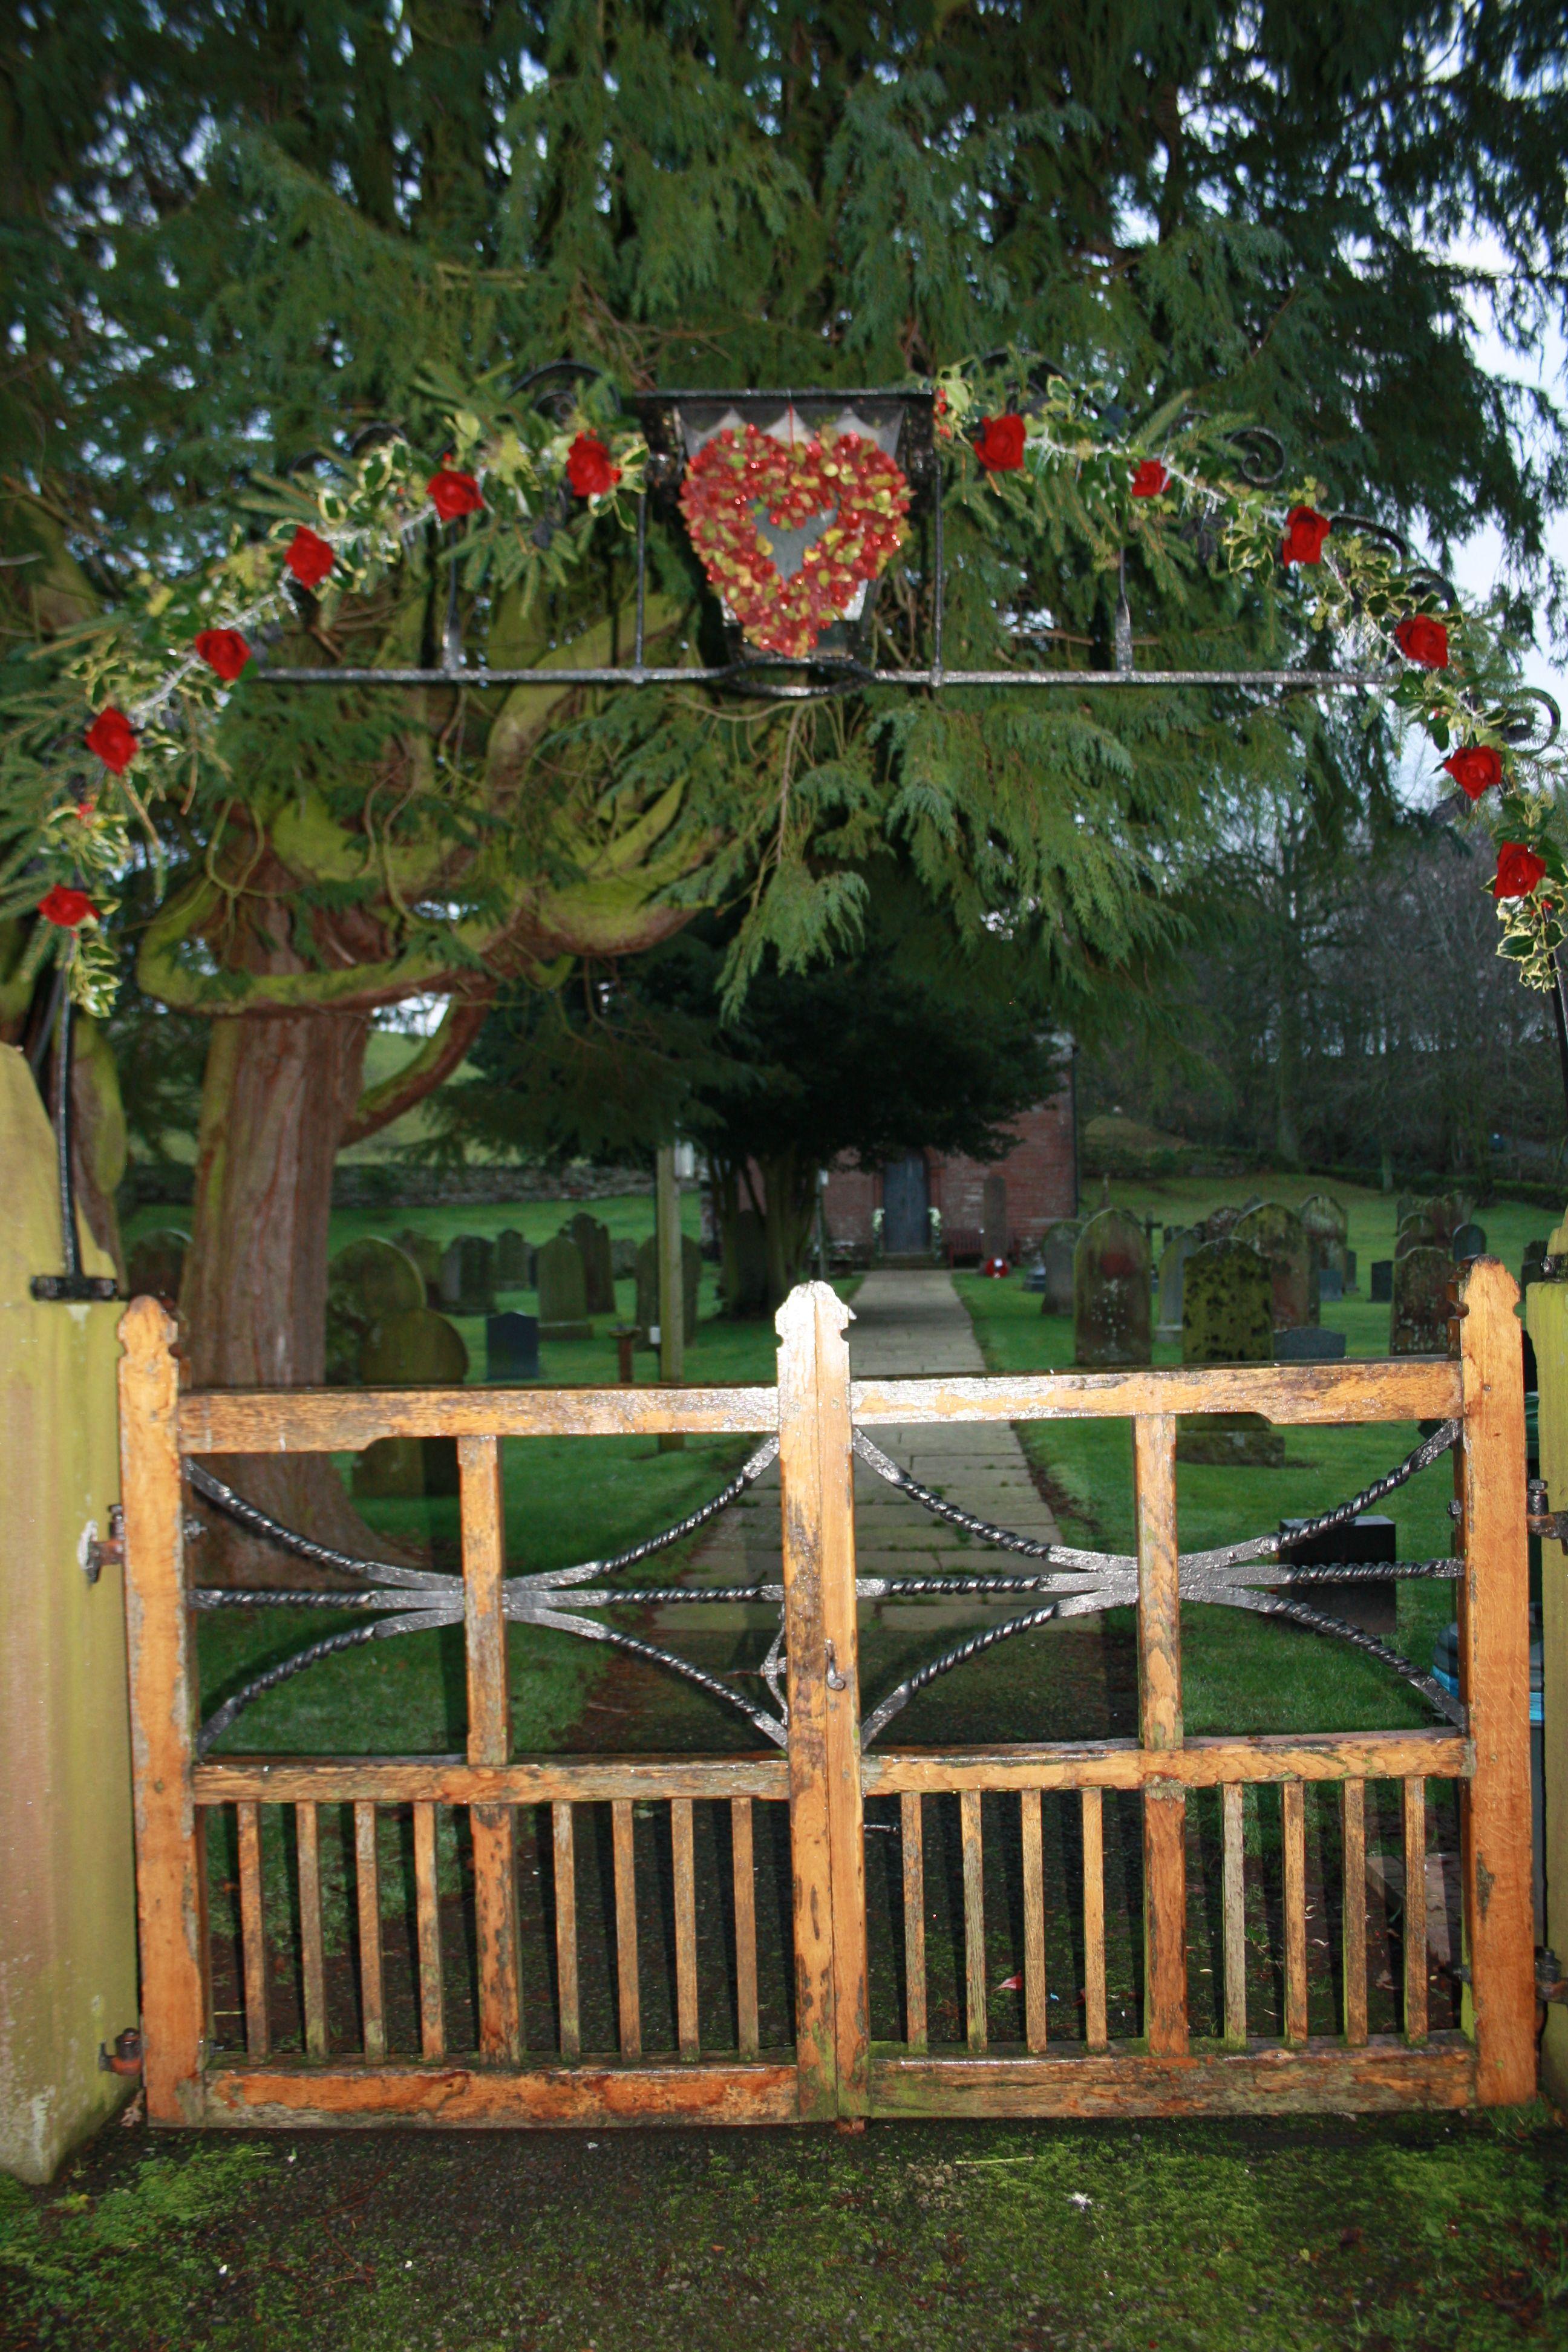 Winter Wedding Church Gate Flowers Fresh Greenery With Silk Red